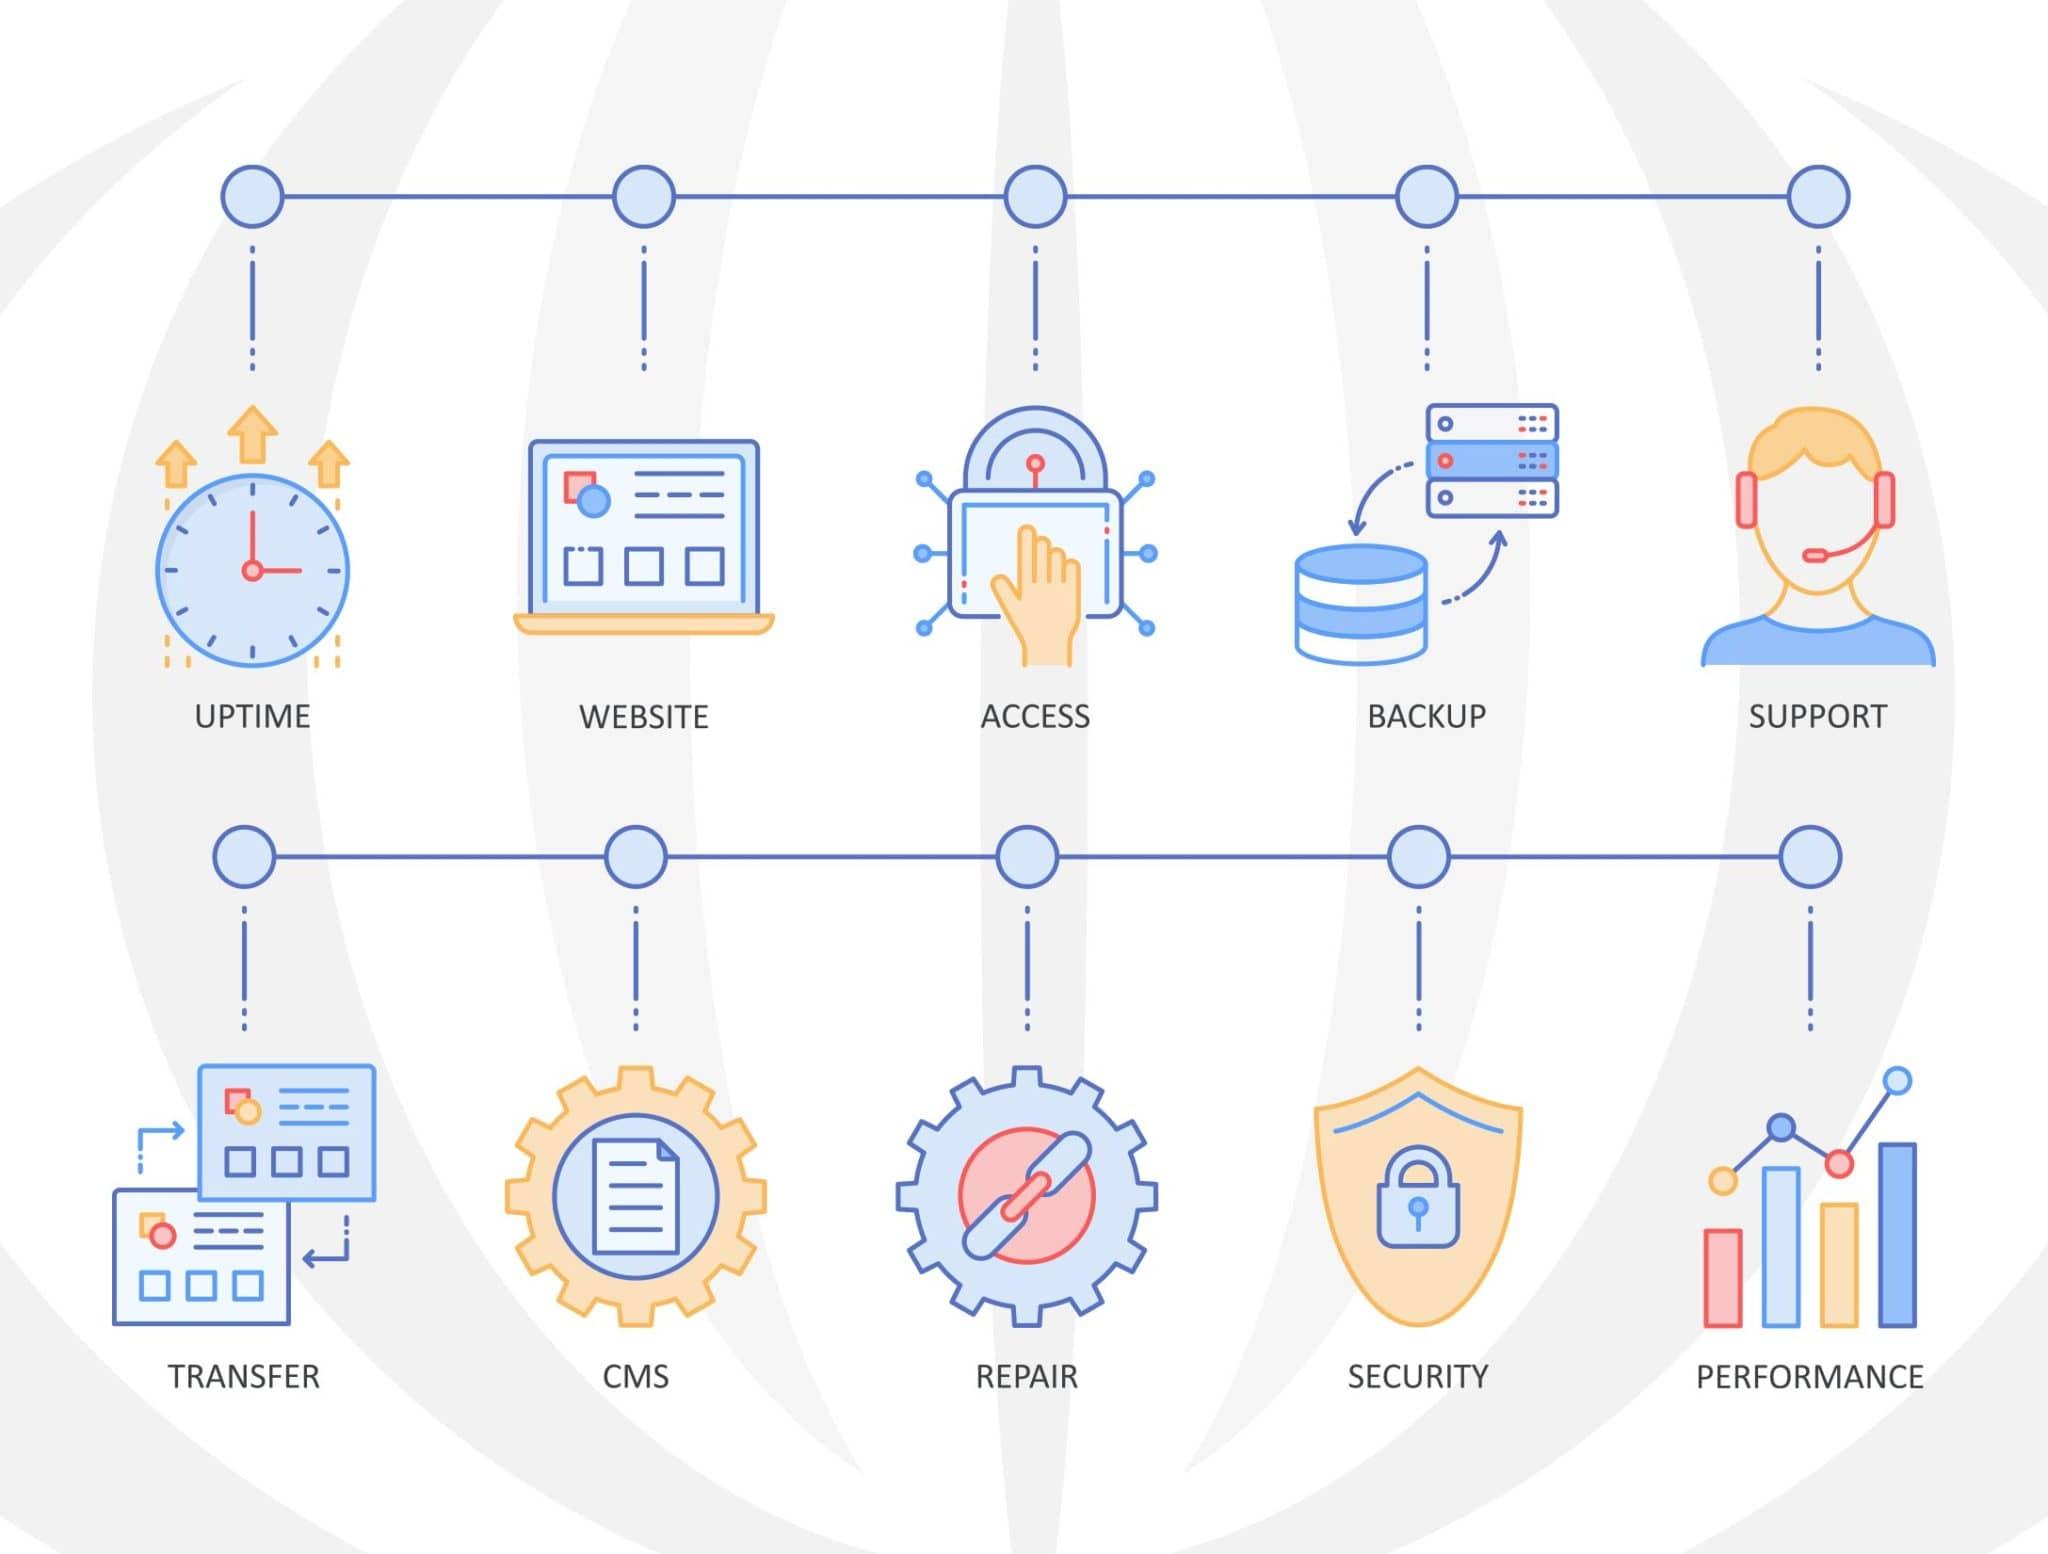 Illustration demonstrating the benefits of web hosting companies